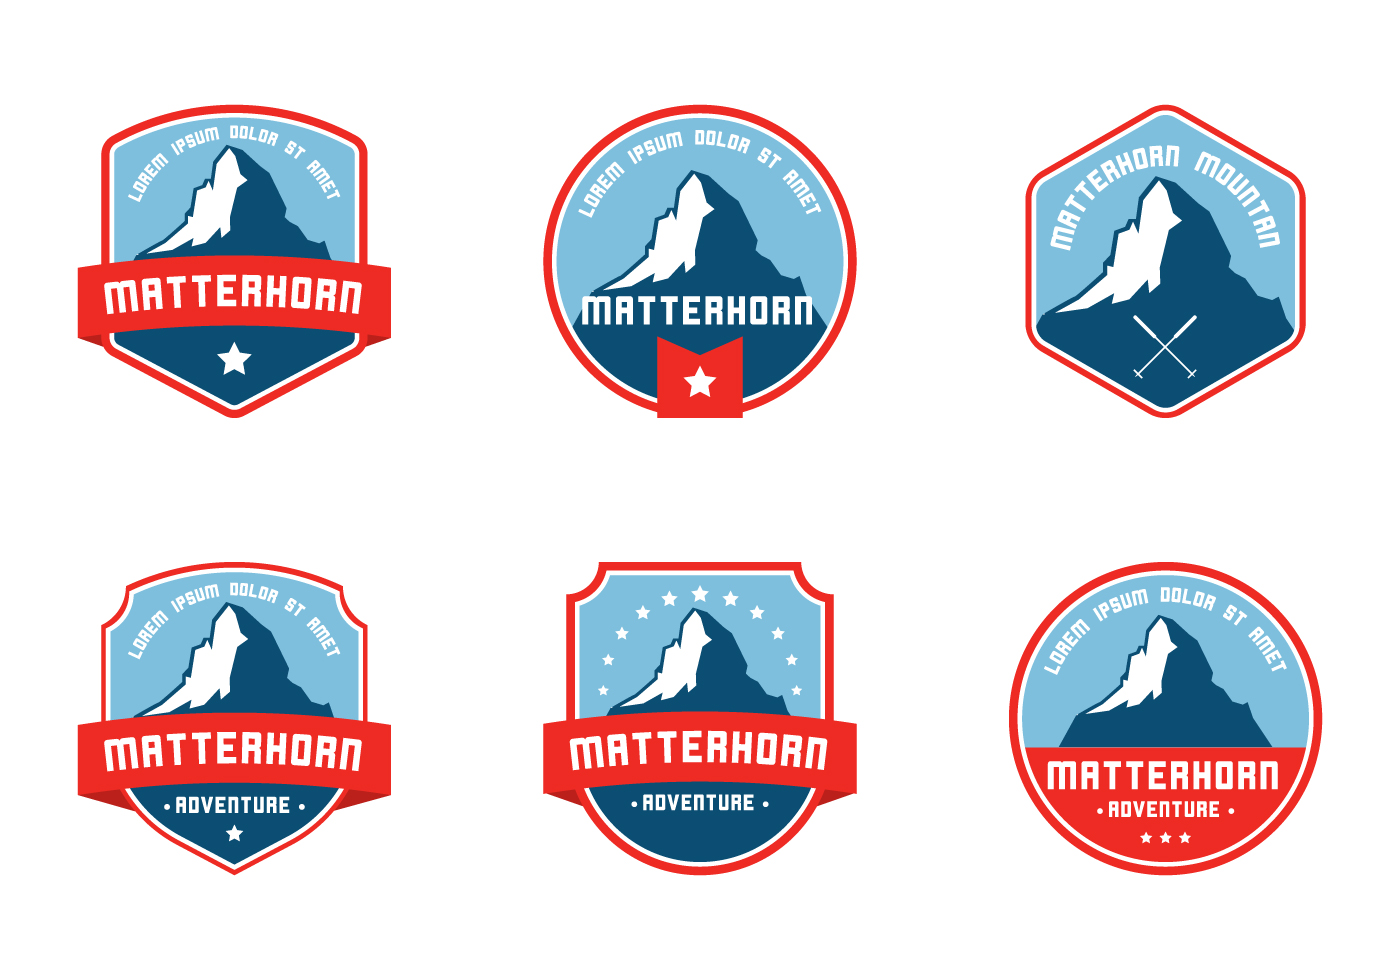 matterhorn badge download free vector art stock graphics images. Black Bedroom Furniture Sets. Home Design Ideas